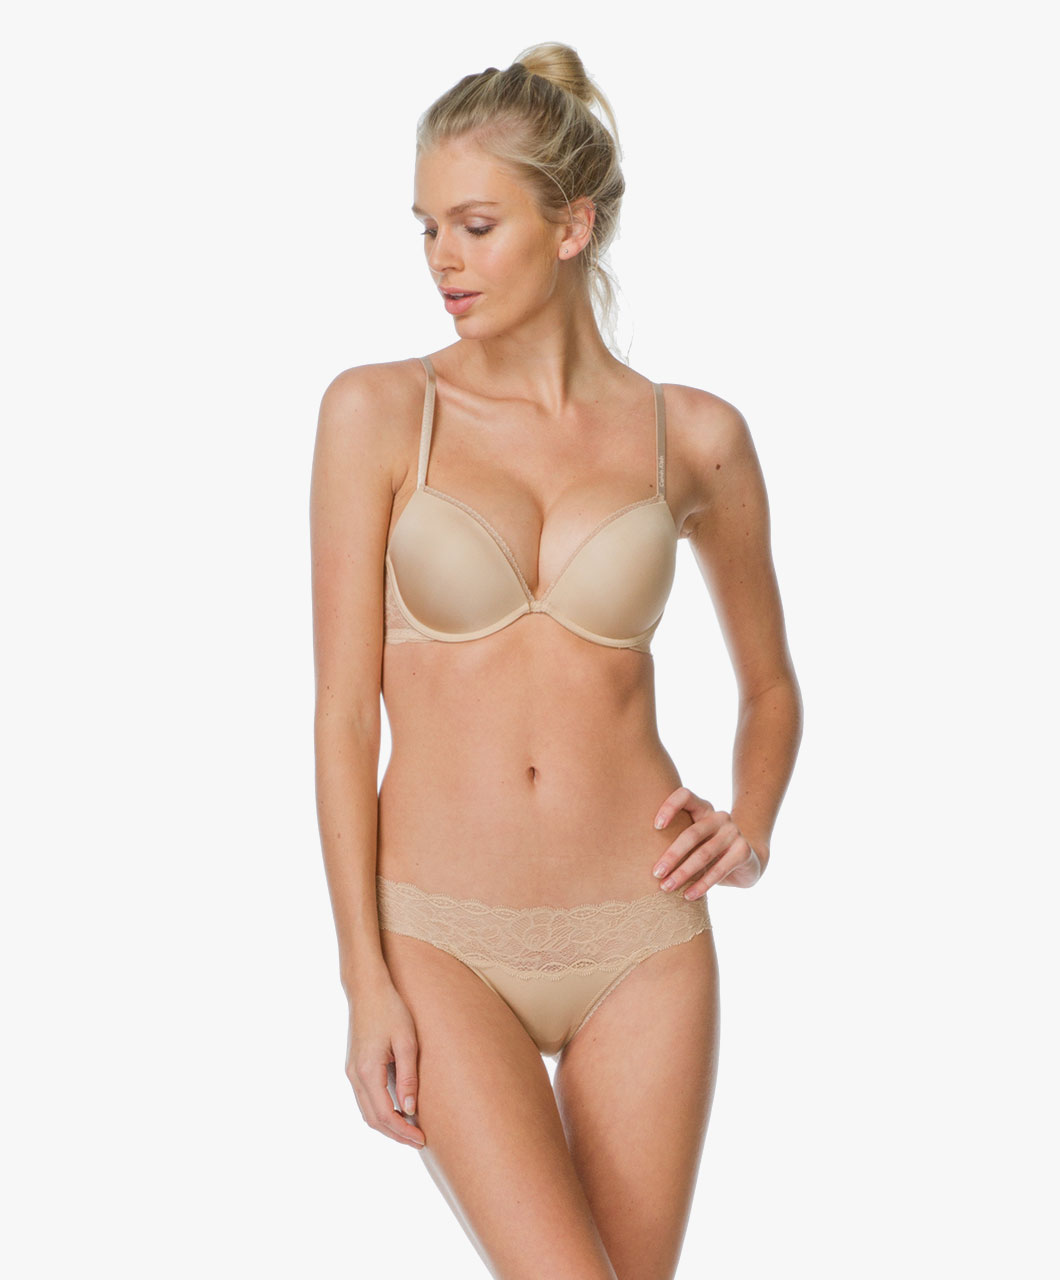 Kalhotky Seductive Comfort Lace QF1200E - Calvin Klein Barva: originál, Velikost: M